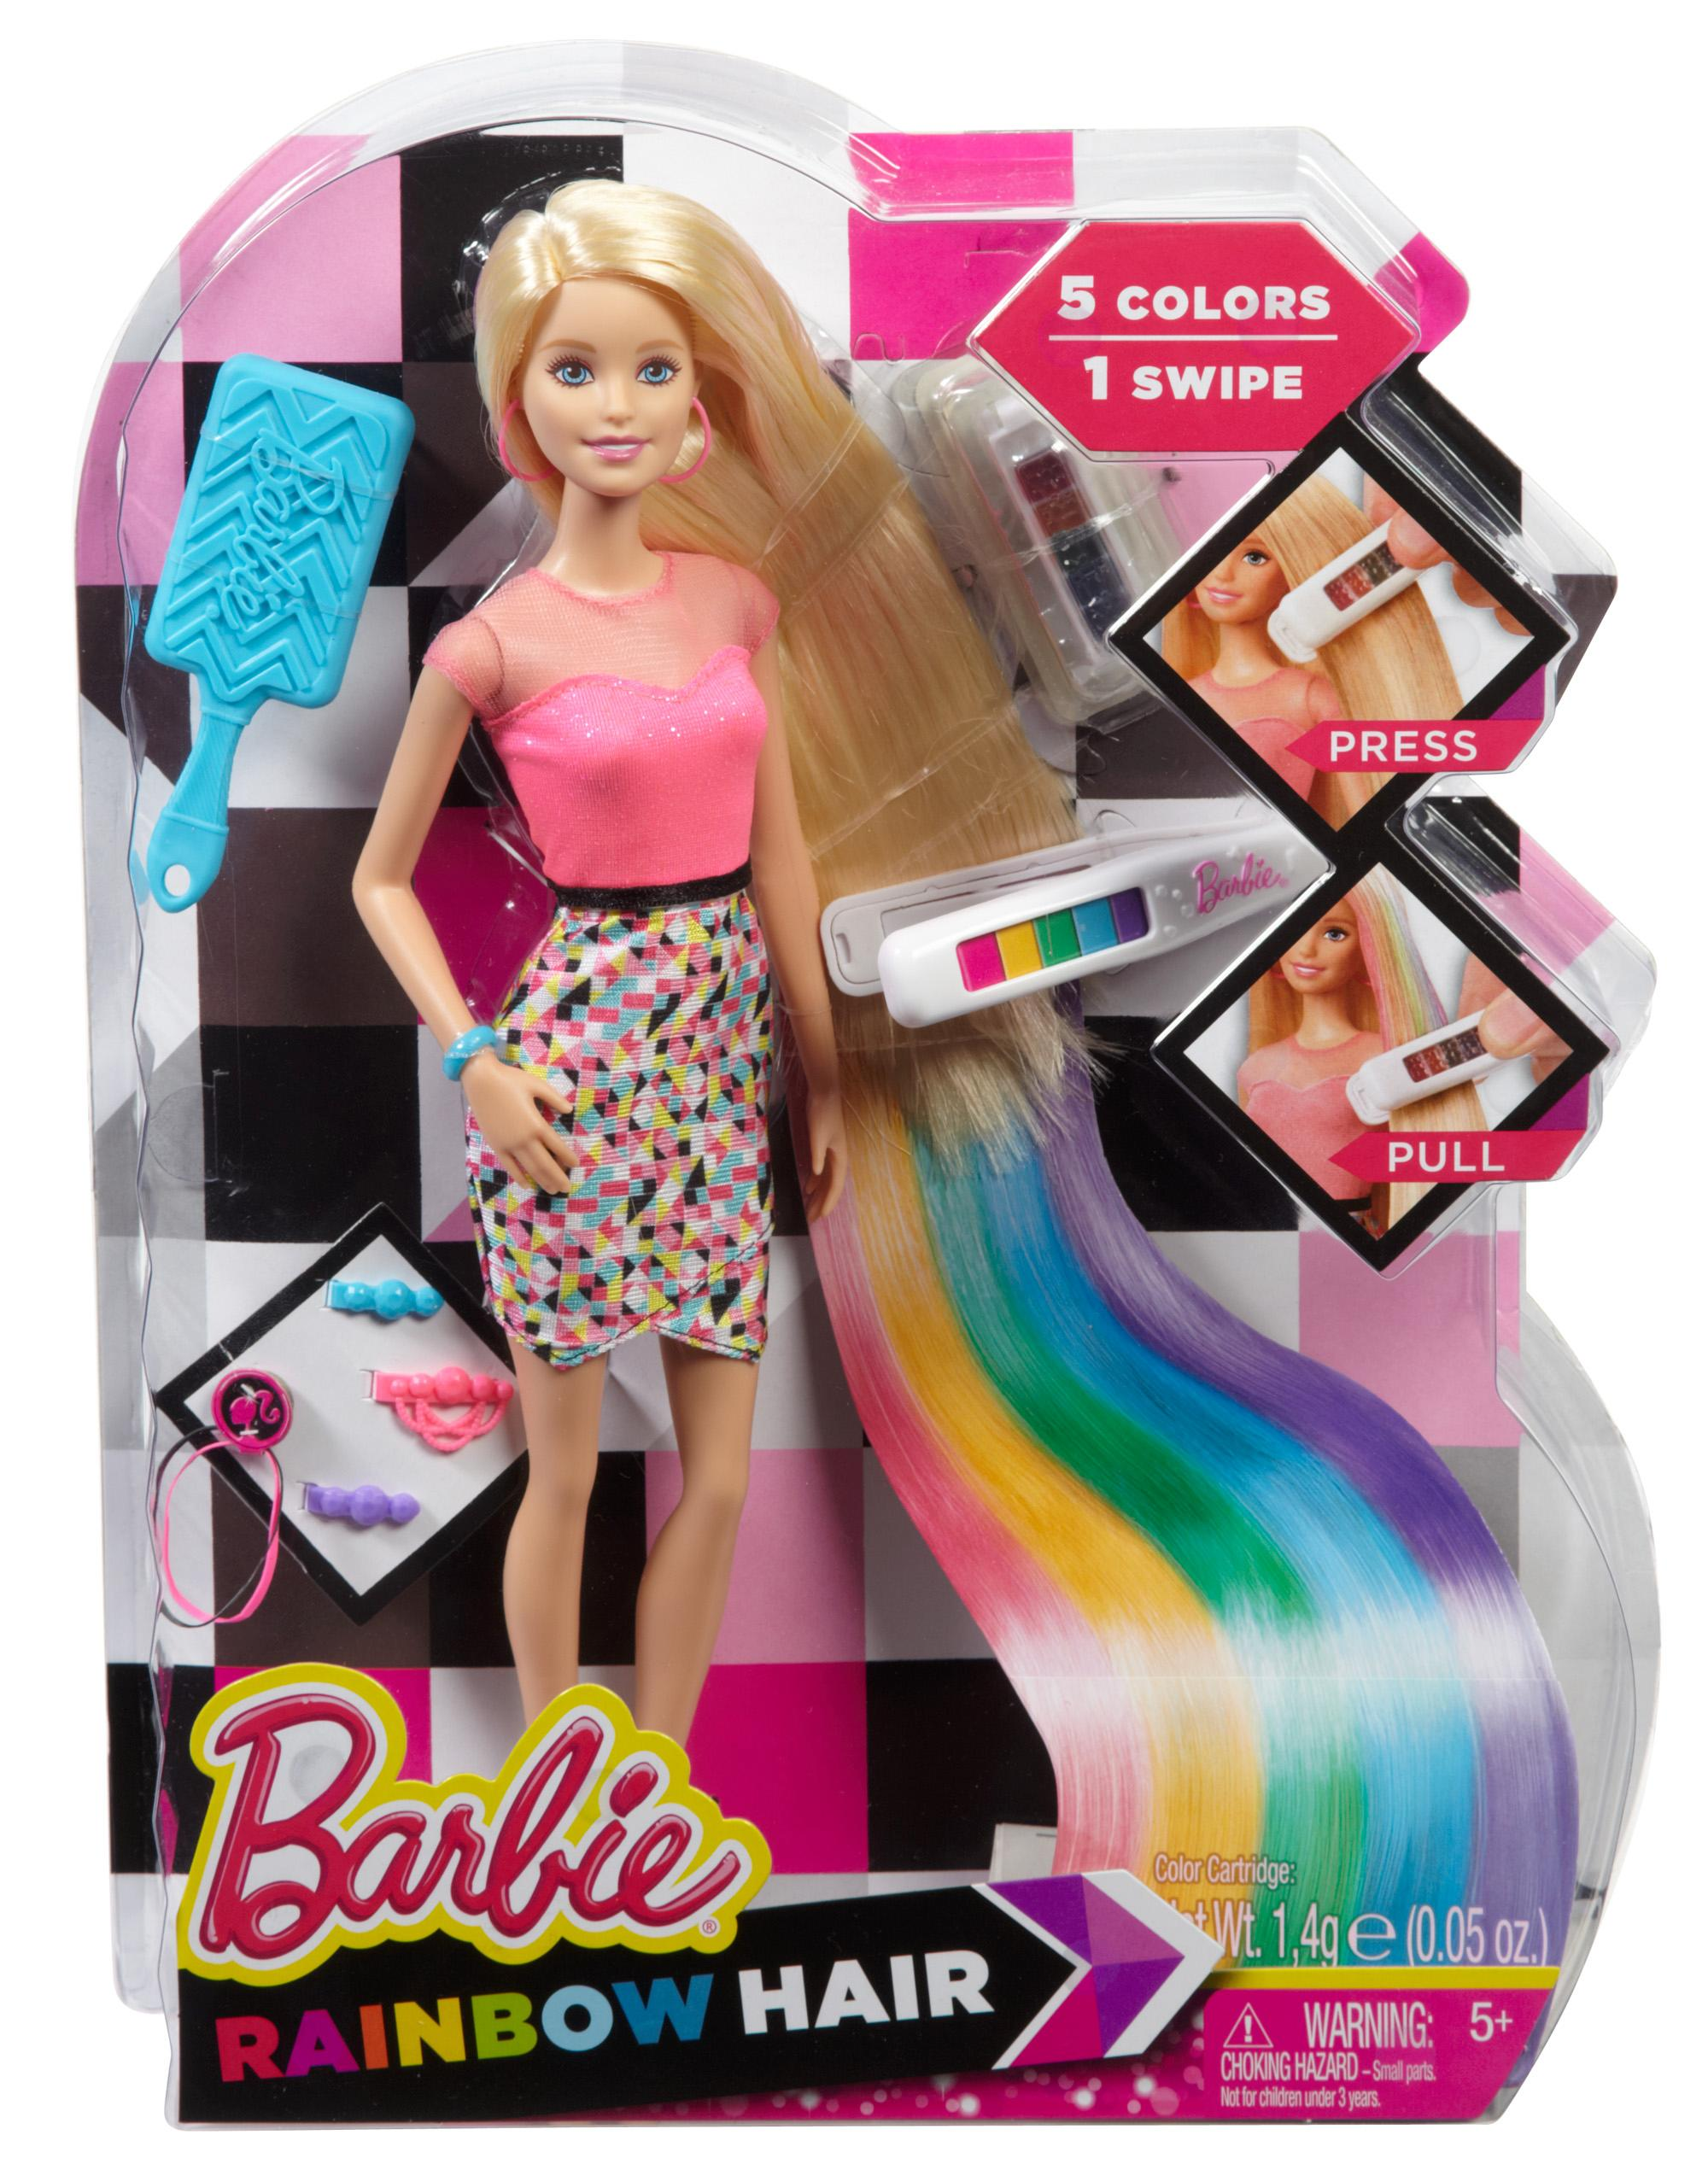 Barbie hair coloring games - Amazoncom